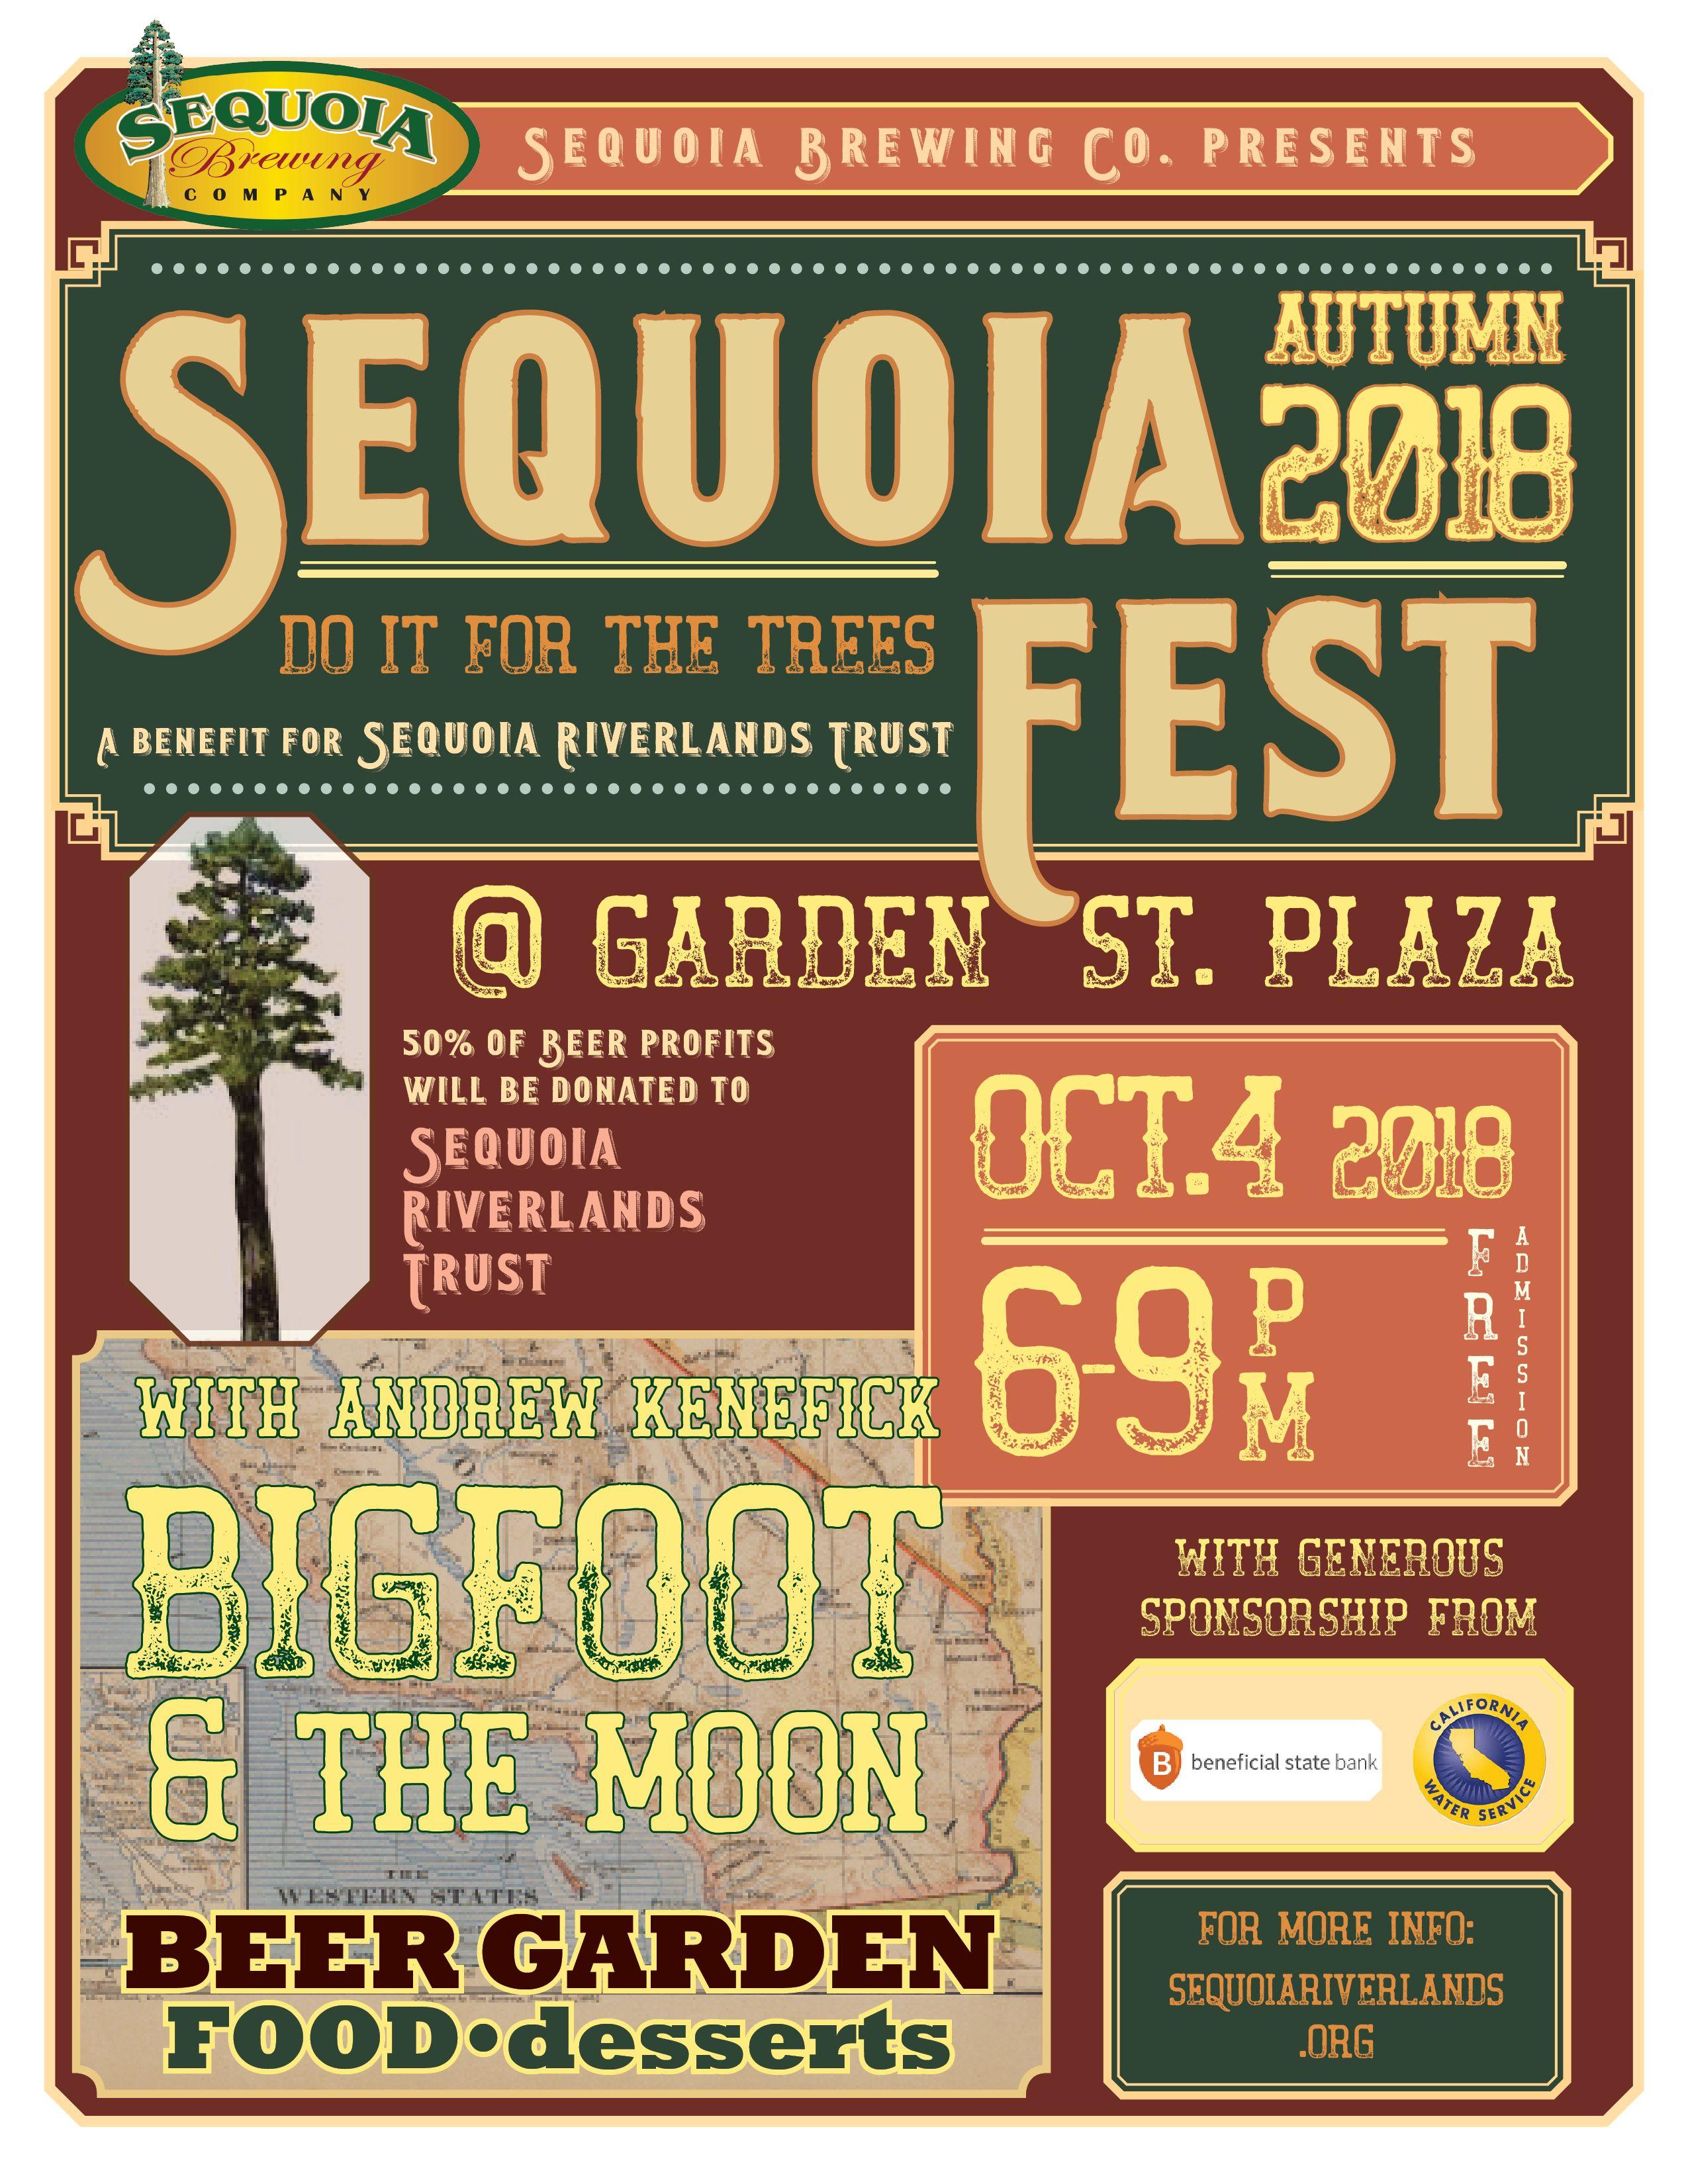 SequoiaFest is back on October 4